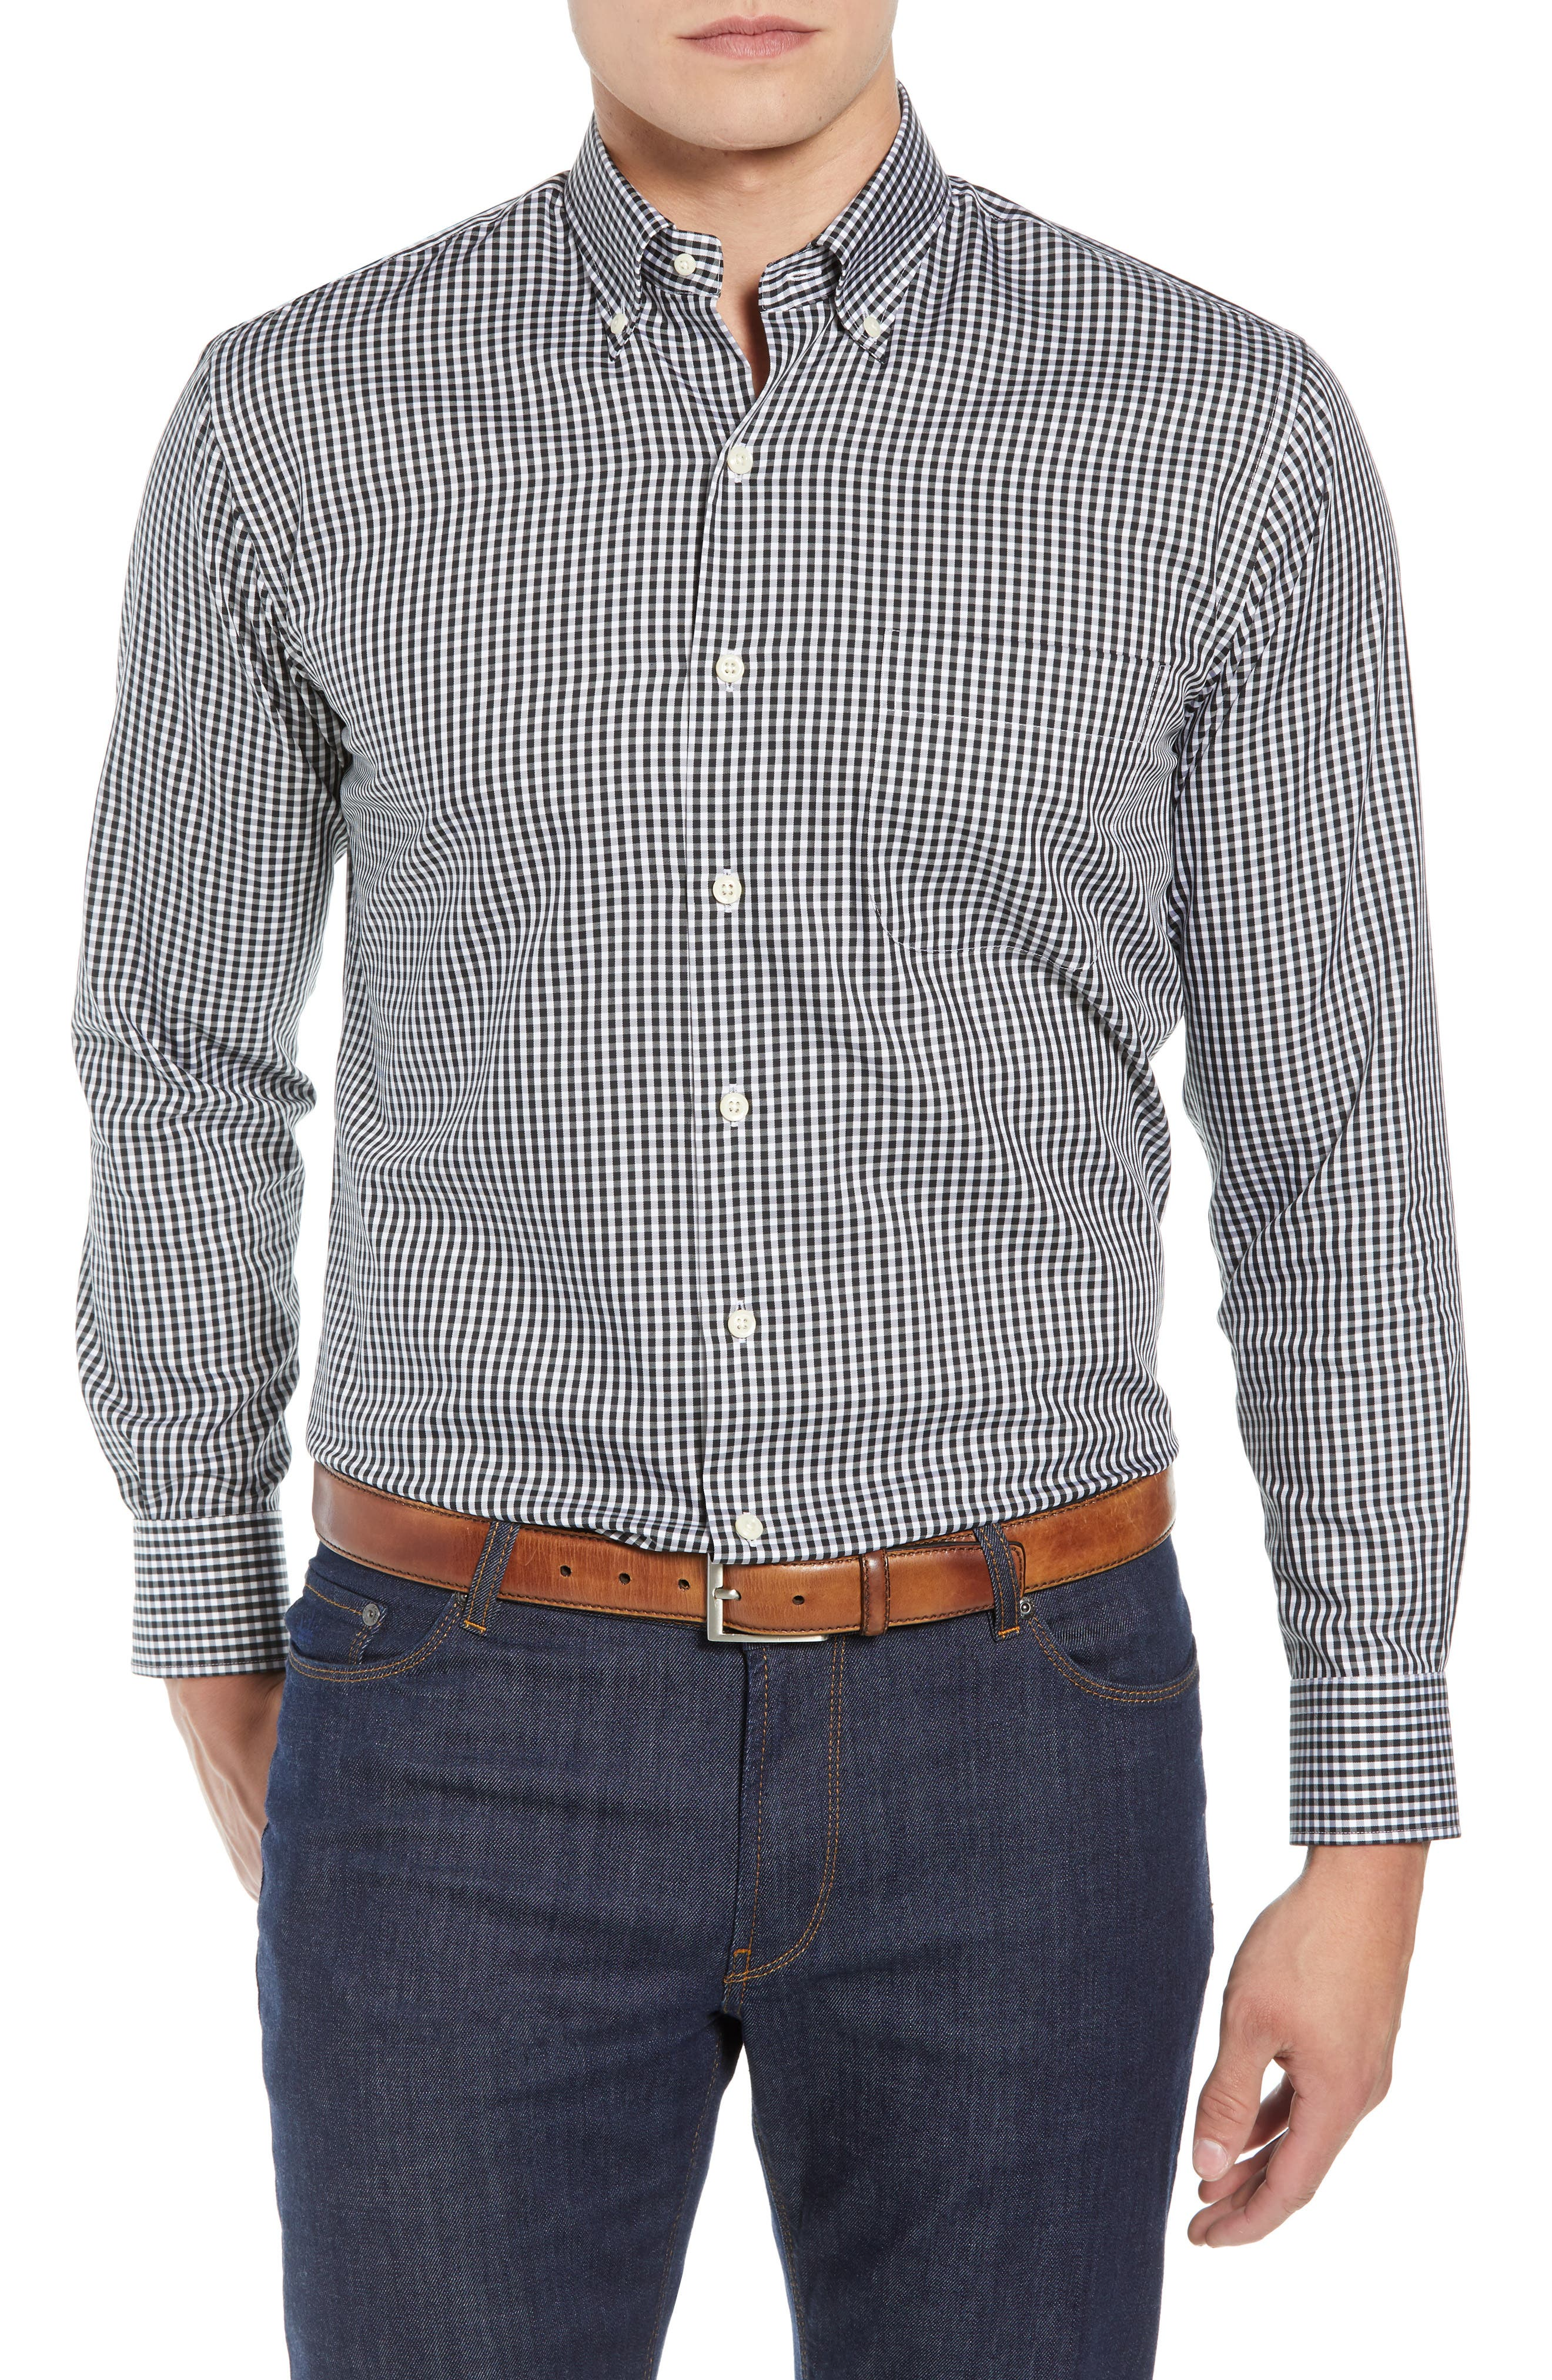 Crown Soft Gingham Regular Fit Sport Shirt,                             Main thumbnail 1, color,                             BLACK